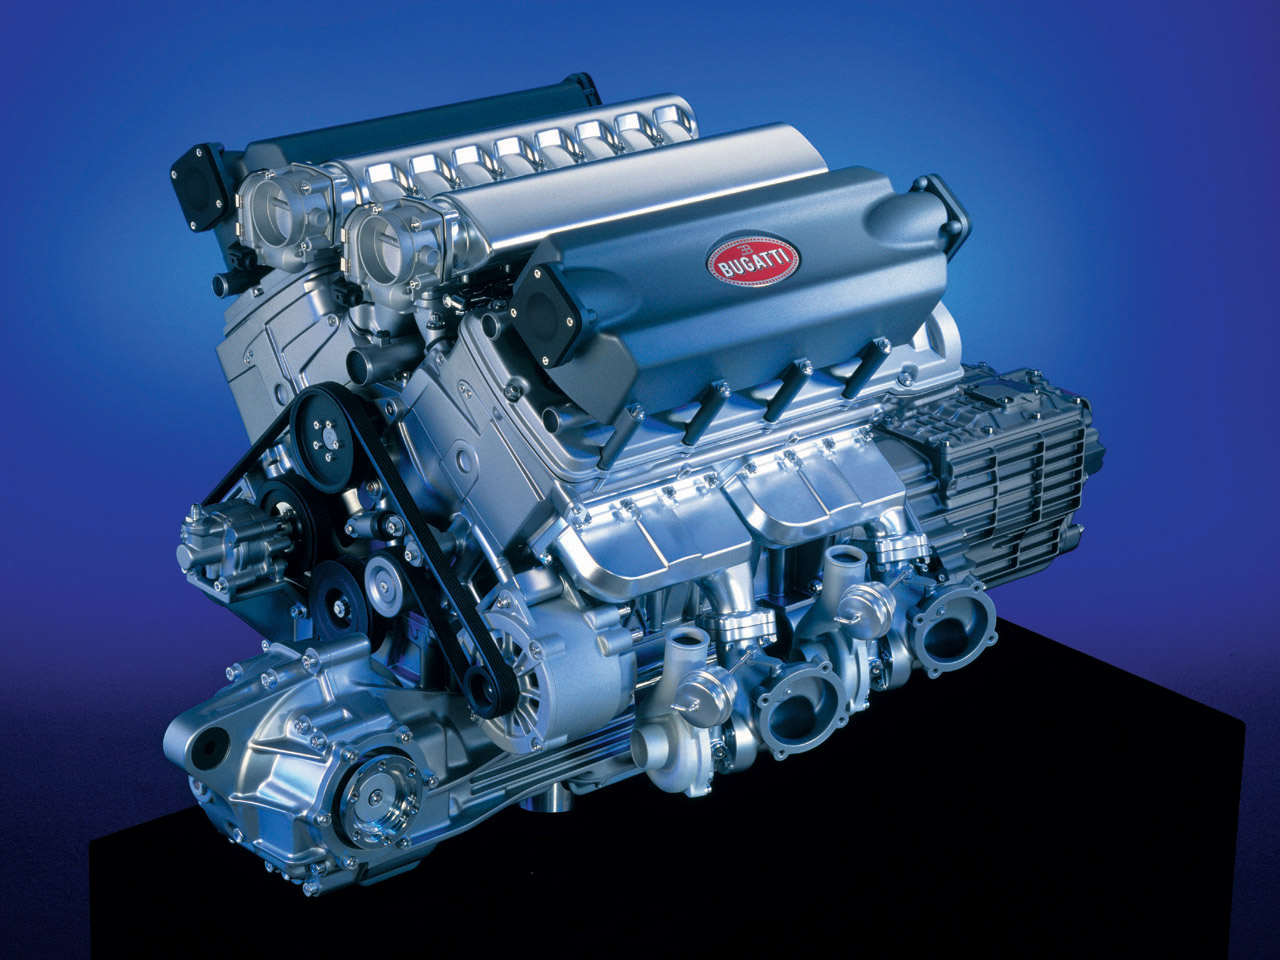 http://4.bp.blogspot.com/-QrViXCSpqGg/Tbo8bydURpI/AAAAAAAAANg/sWnhaYoiOrI/s1600/Bugatti-EB-16-4-Veyron-engine-study-1280x960.jpg